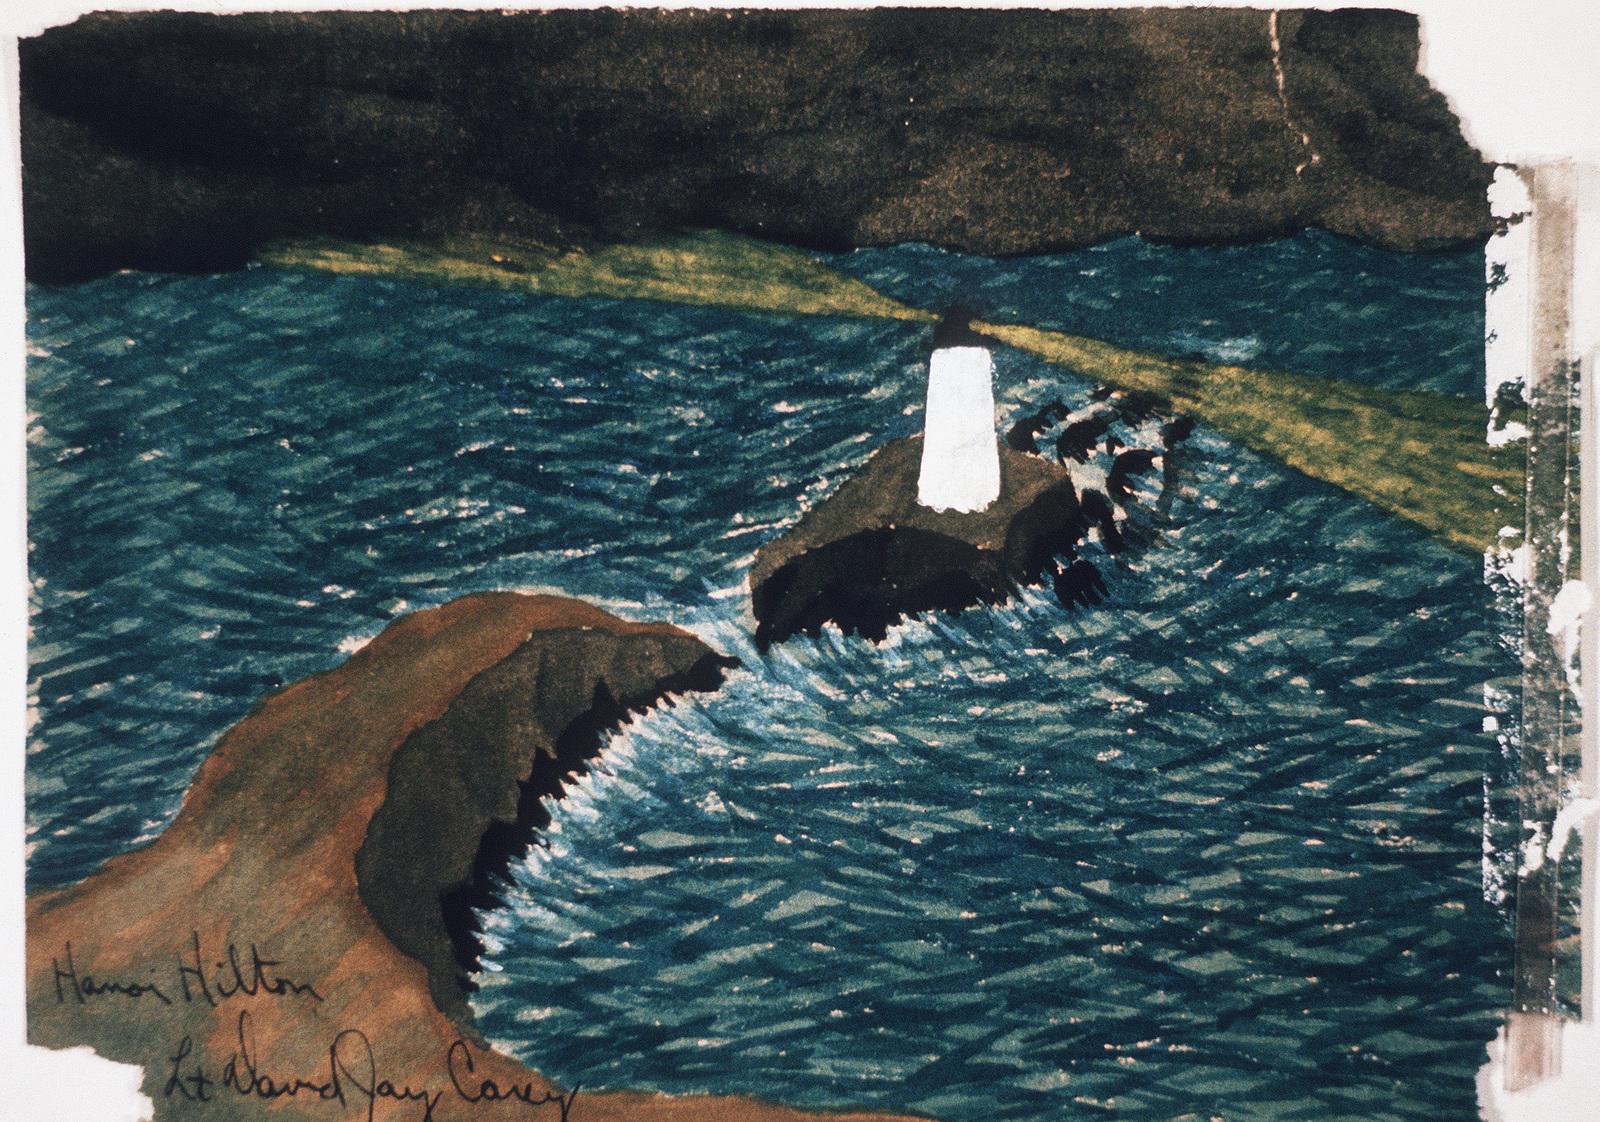 "Artwork: Prisoners of War Art - Vietnam, ""Hanoi Hilton"" camp of detention for U.S. prisoners captured in Vietnam - untitled (lighthouse on island) Artist: LT. David Jay Carey"